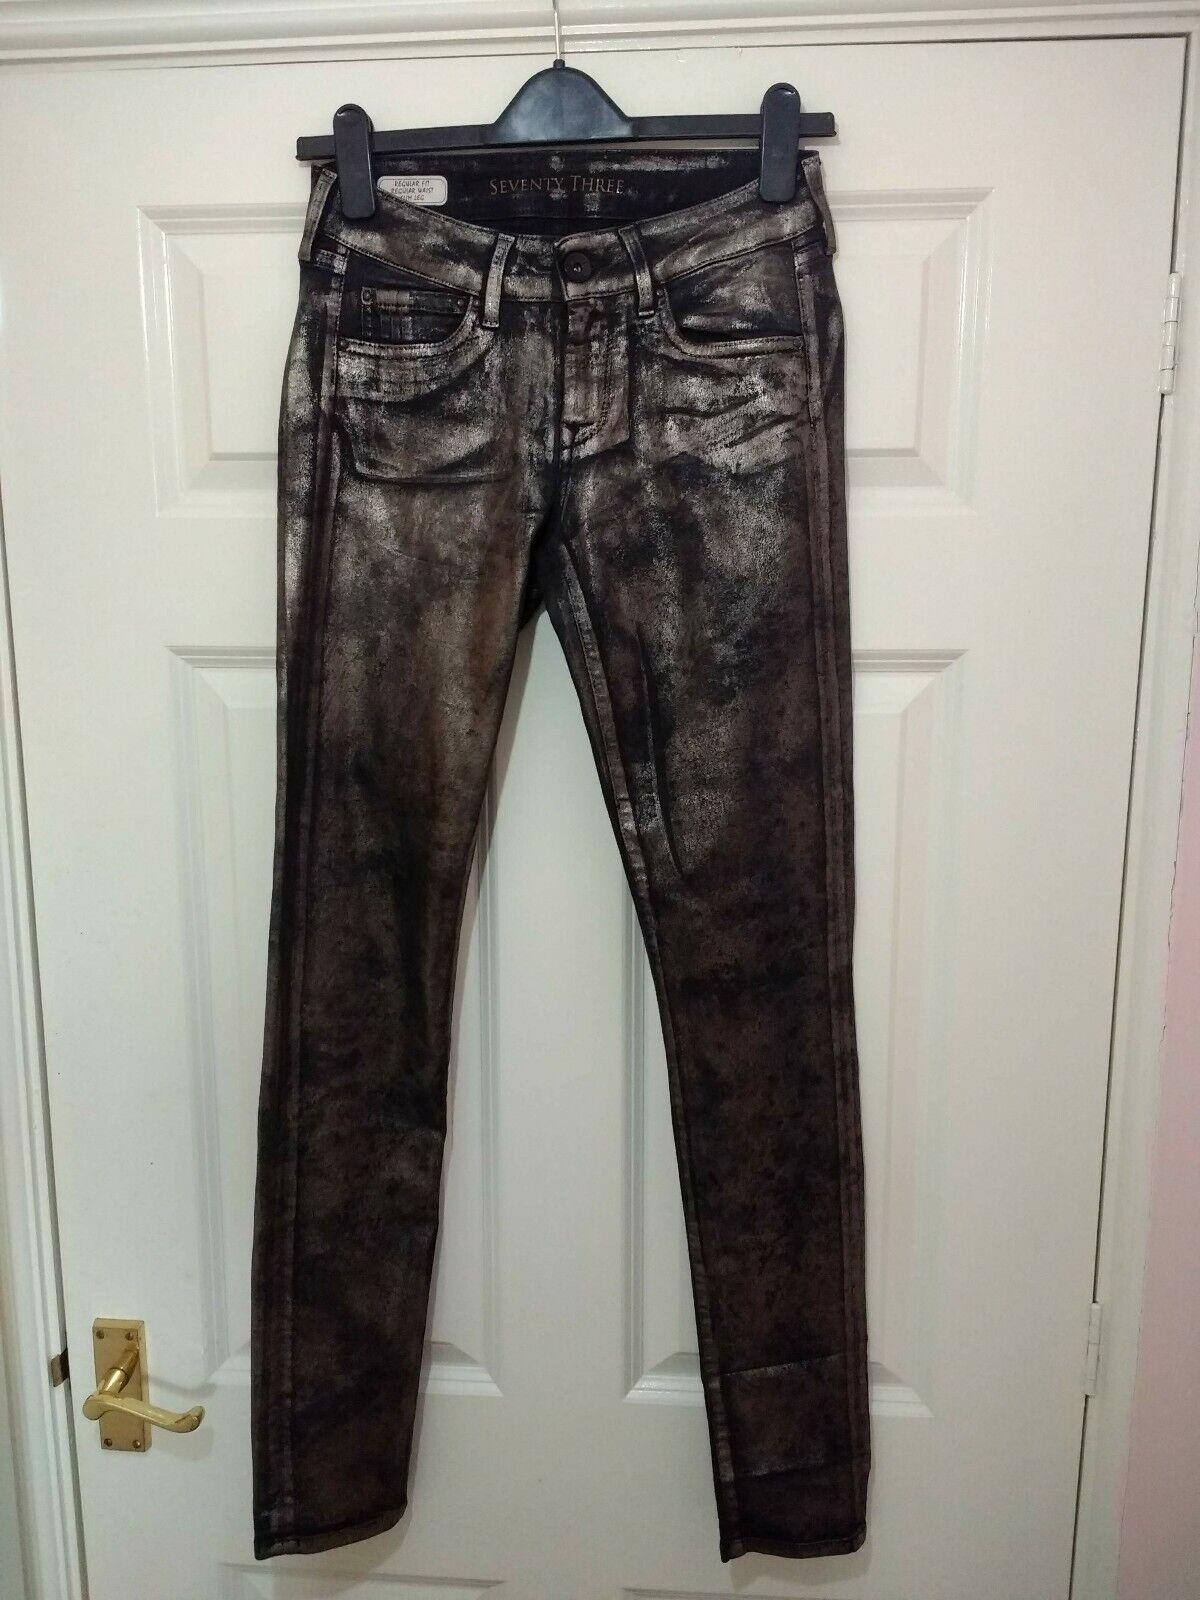 Rare Seventy Three Pepe Jeans Bronze Metallic Jeans Regular Fit Slim Leg